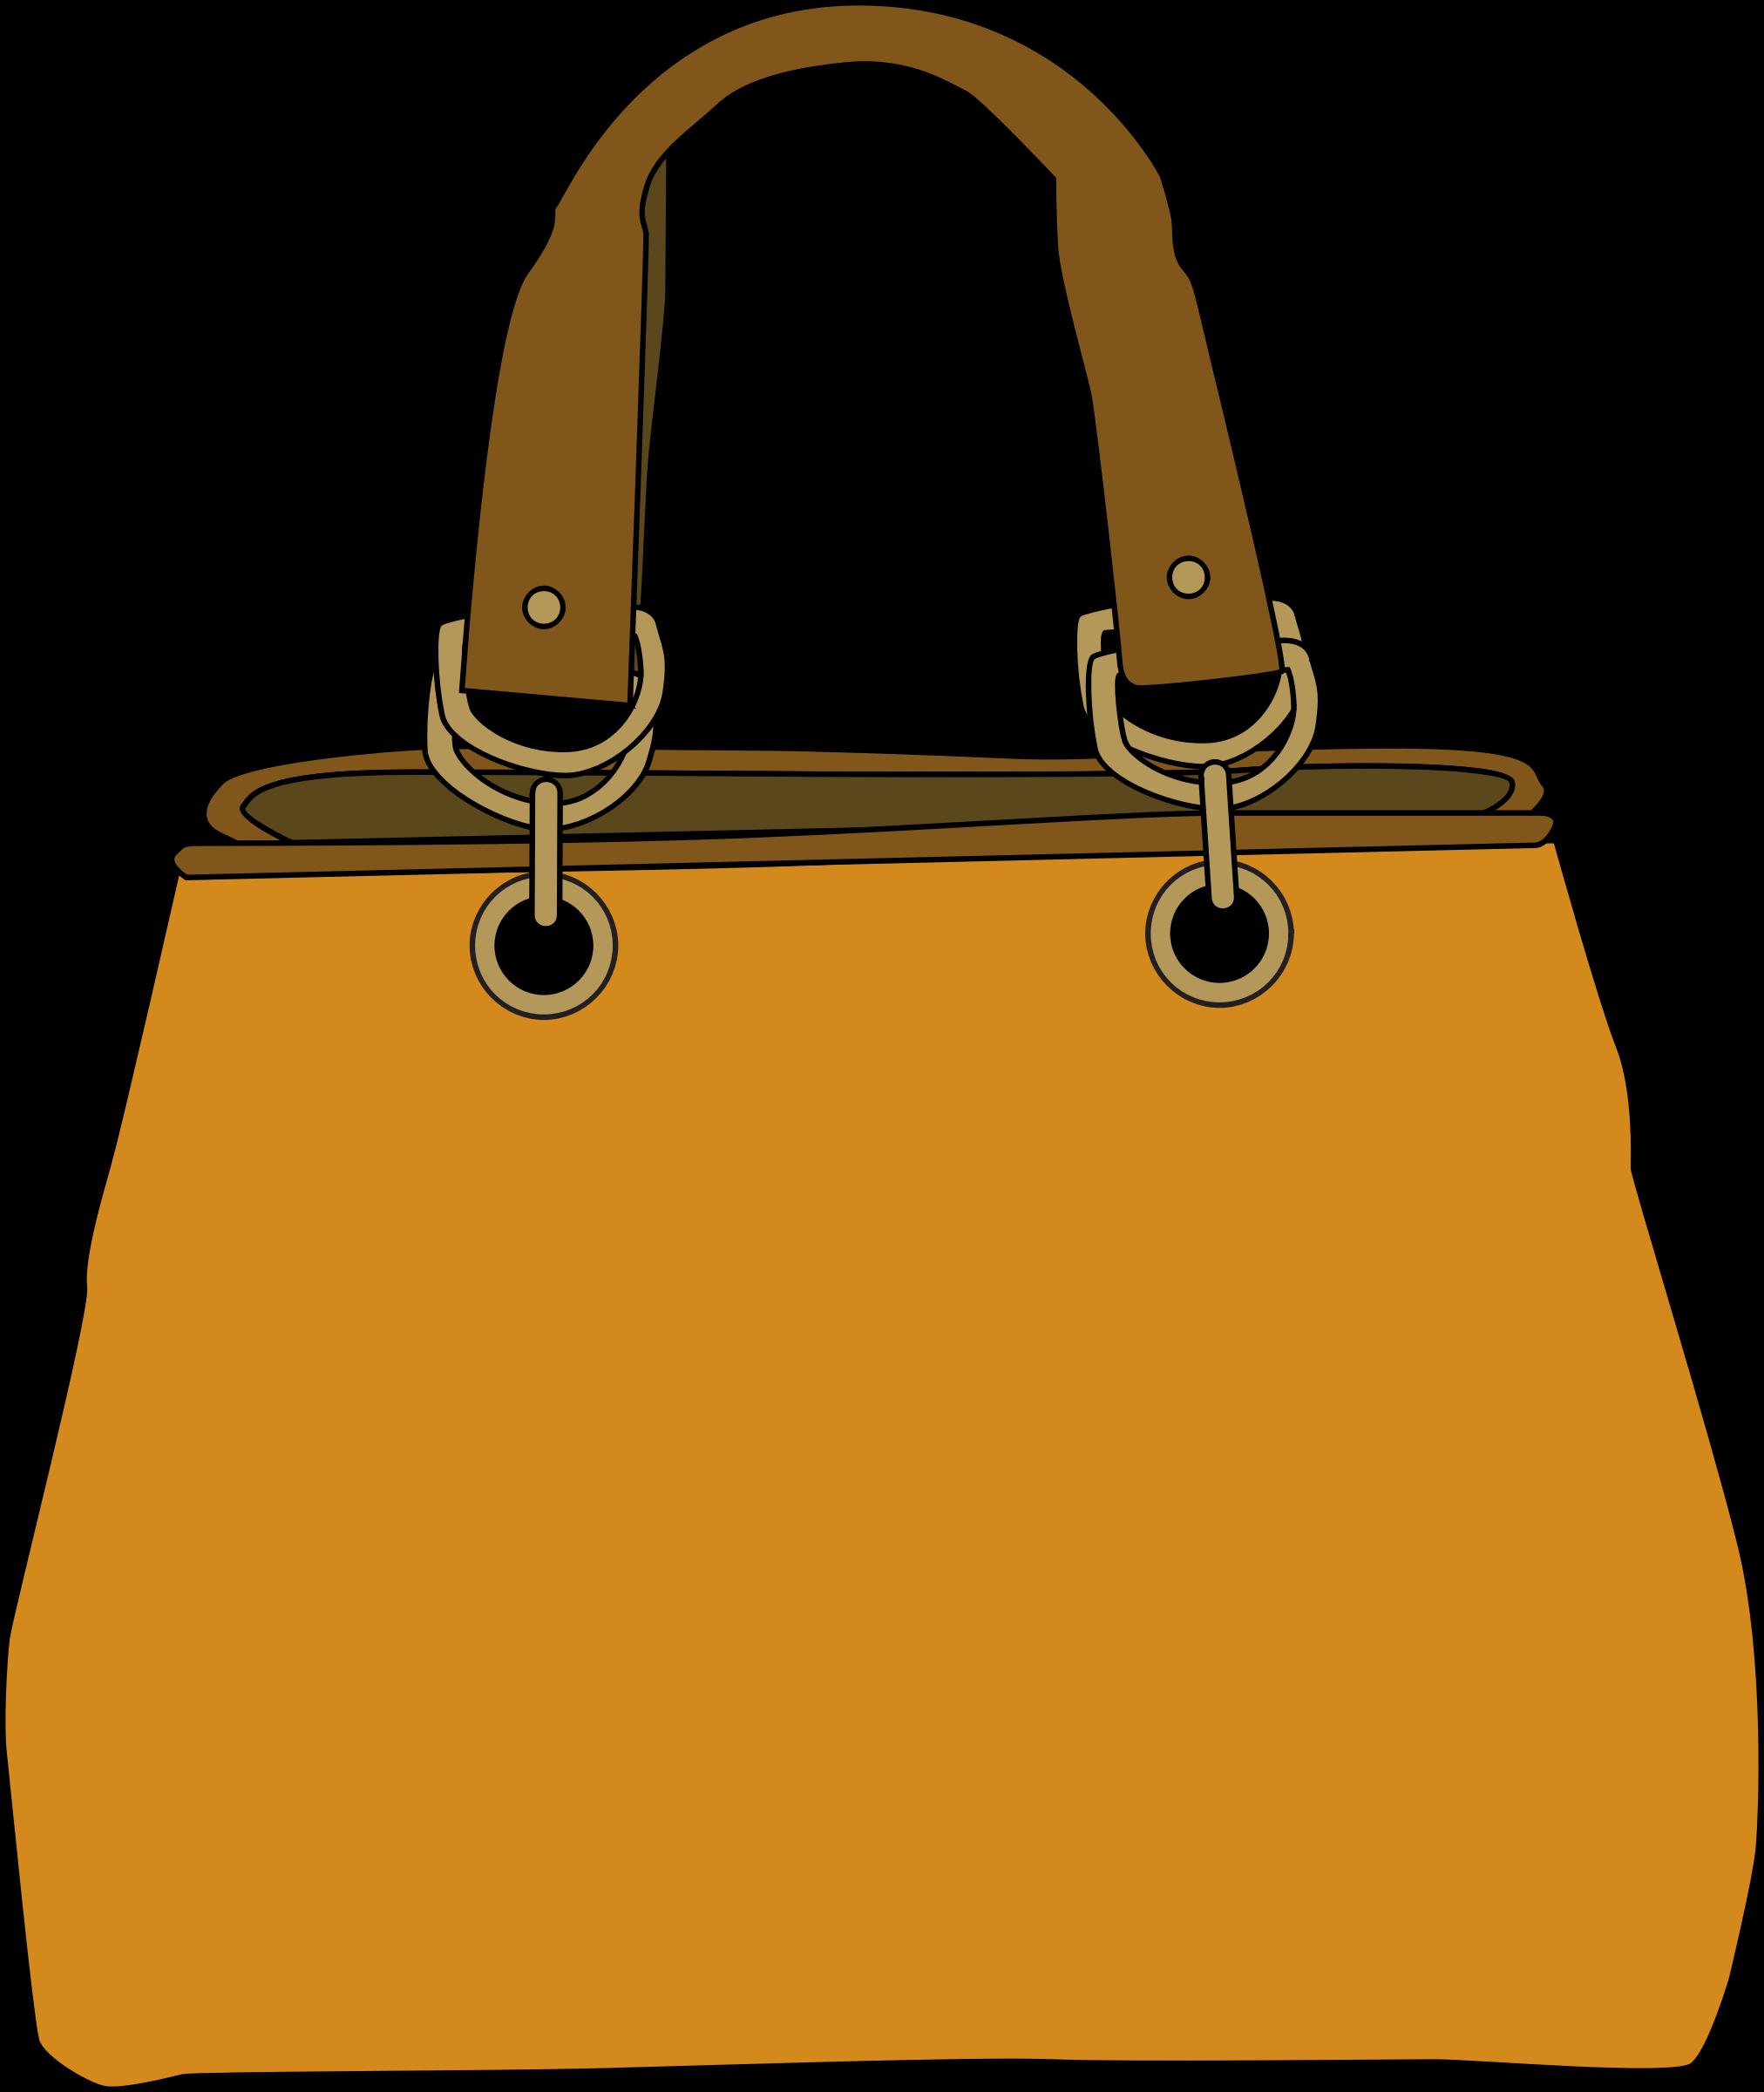 Women S Shoulder Bags Png Transparent Images 33 Free Transparent Png Images Icons And Clip Arts Leather Tote Bag Tote Bag Leather Handbag Straps